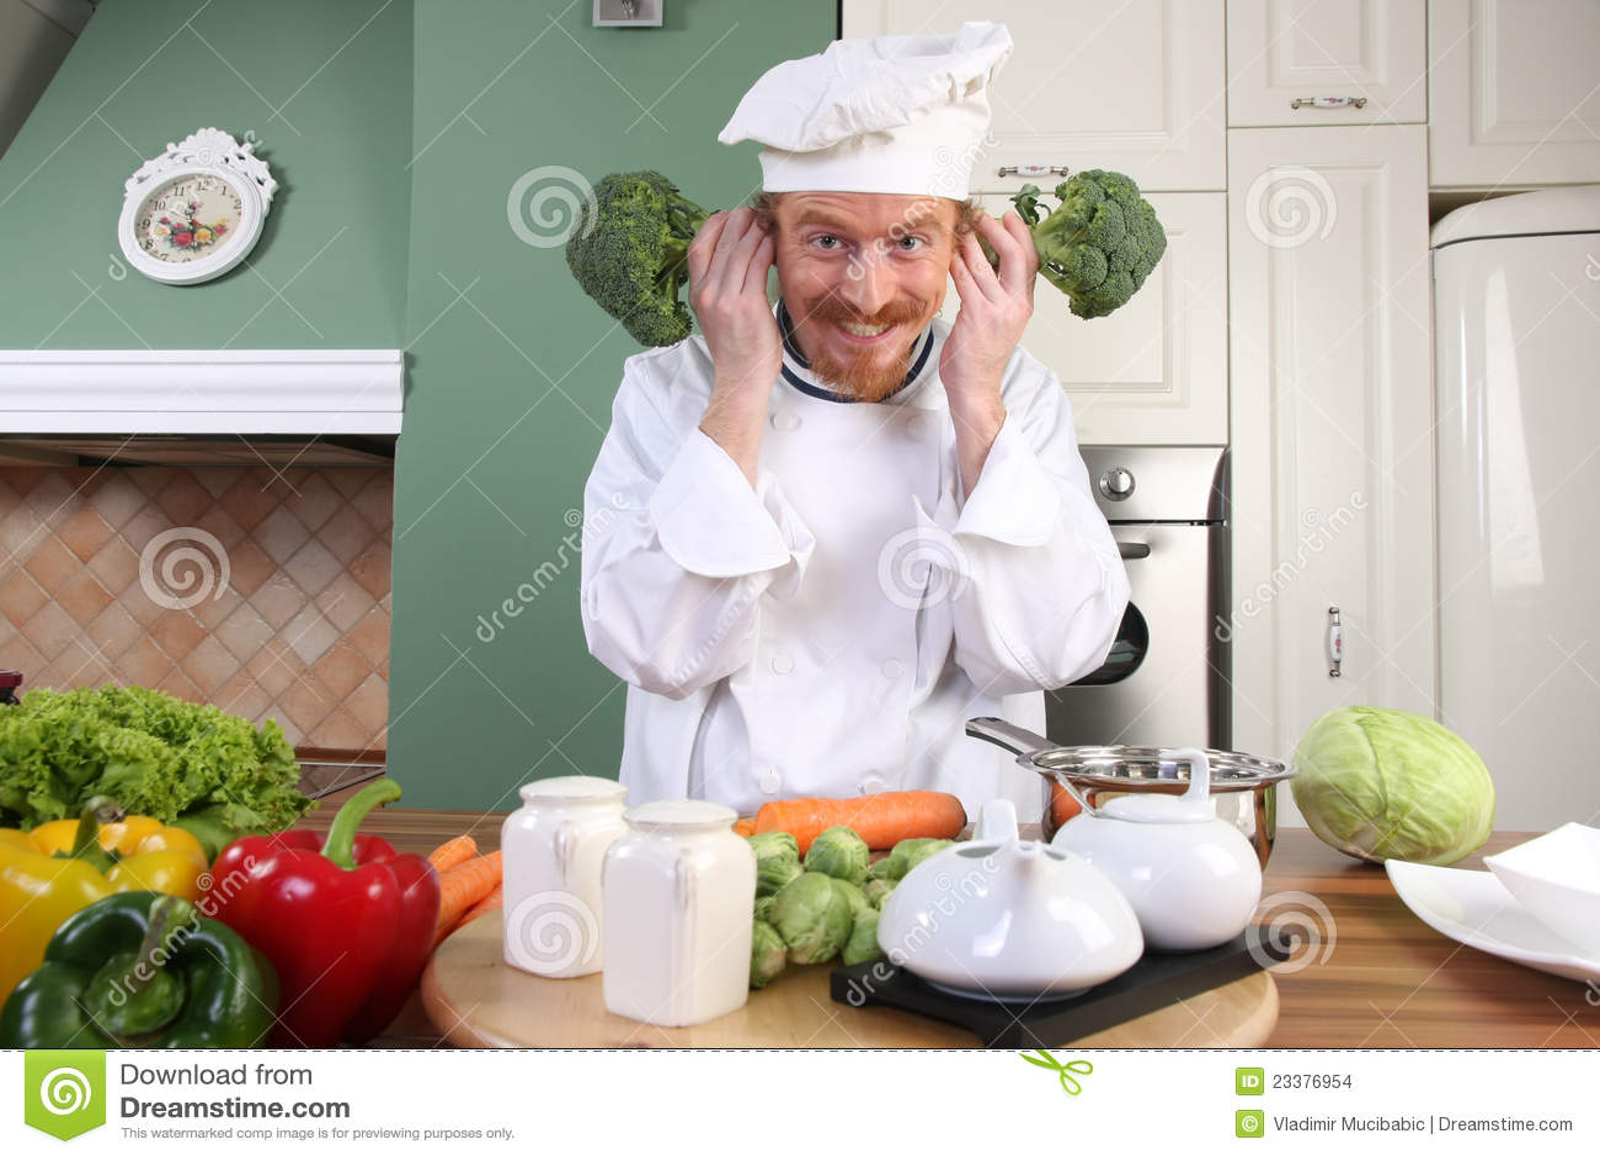 Chef S Kitchen Clotheds